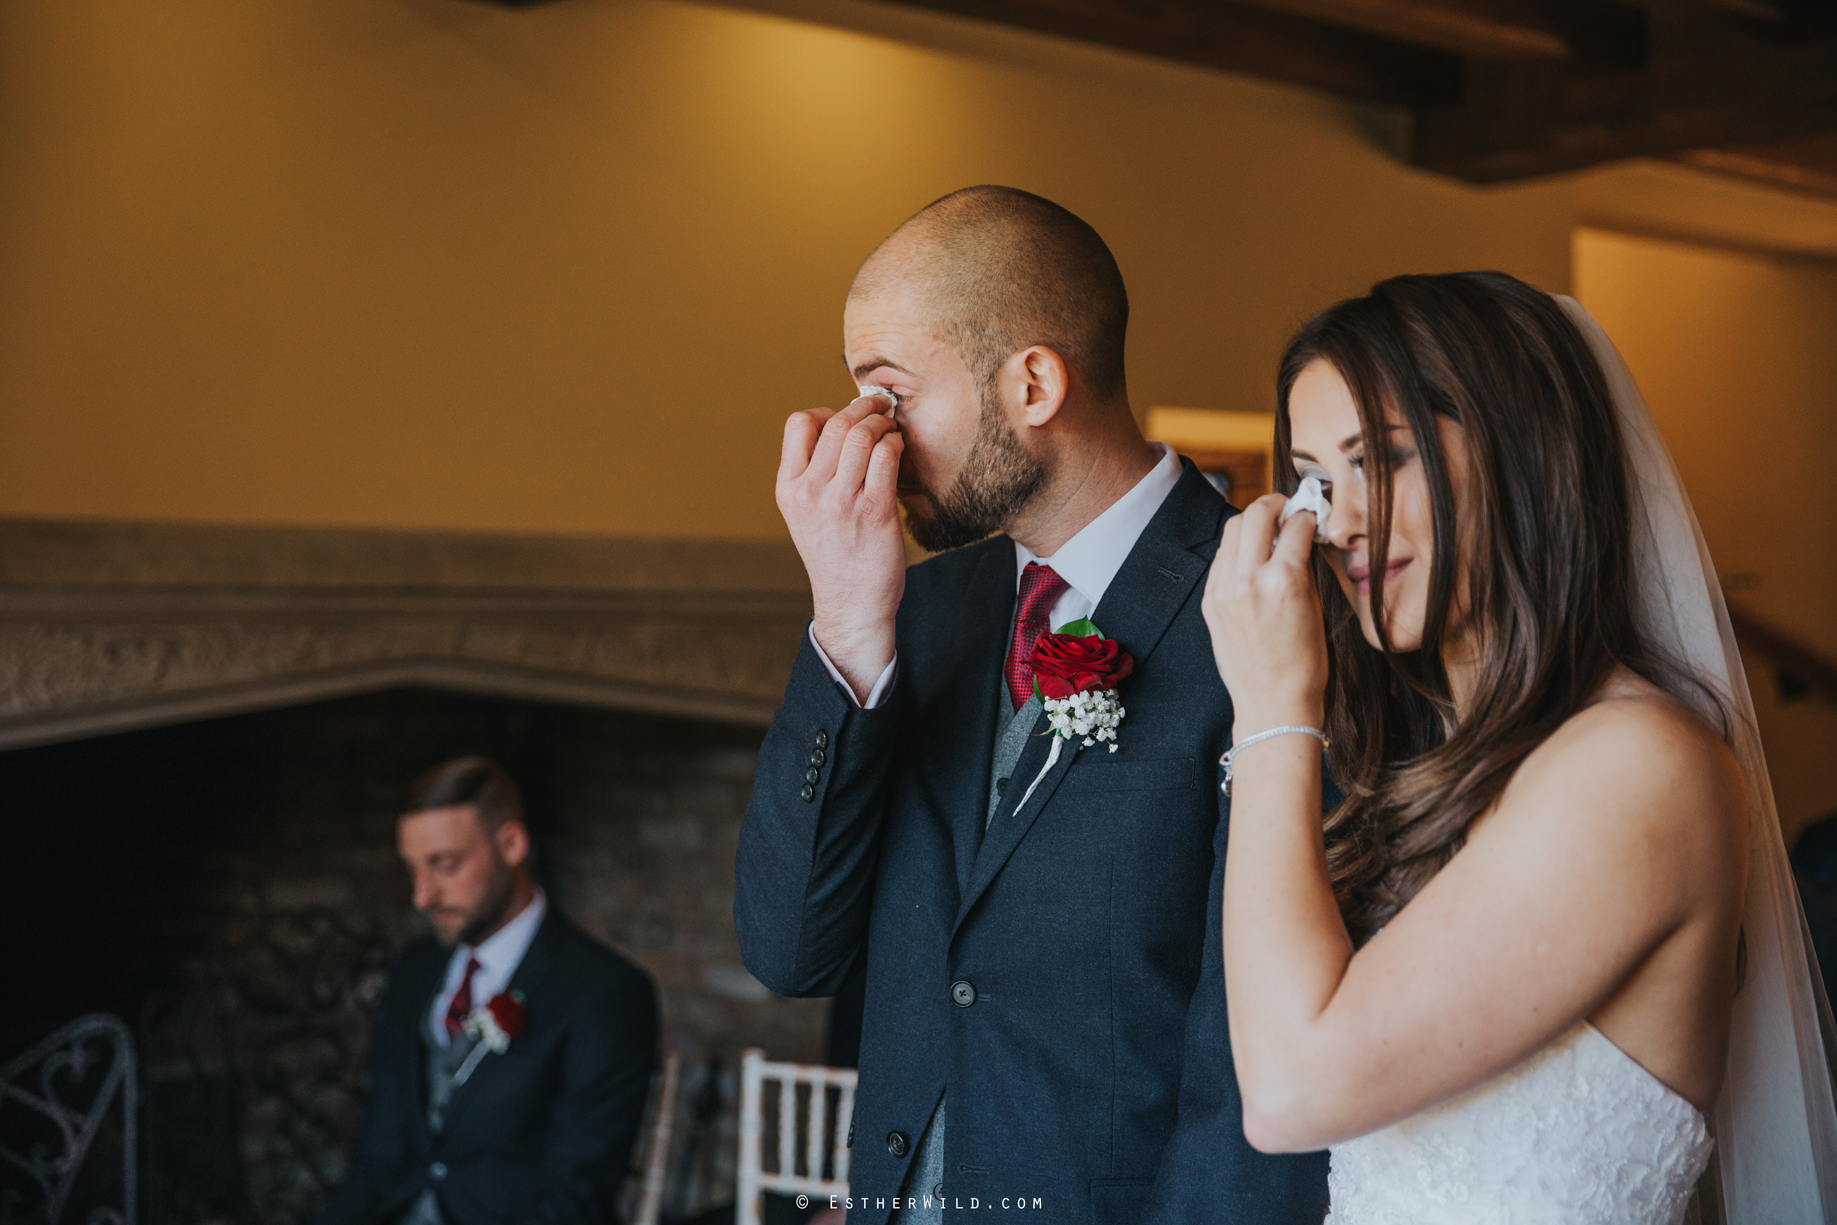 Old_Hall_Ely_Wedding_Copyright_Esther_Wild_Photographer_IMG_1268.jpg